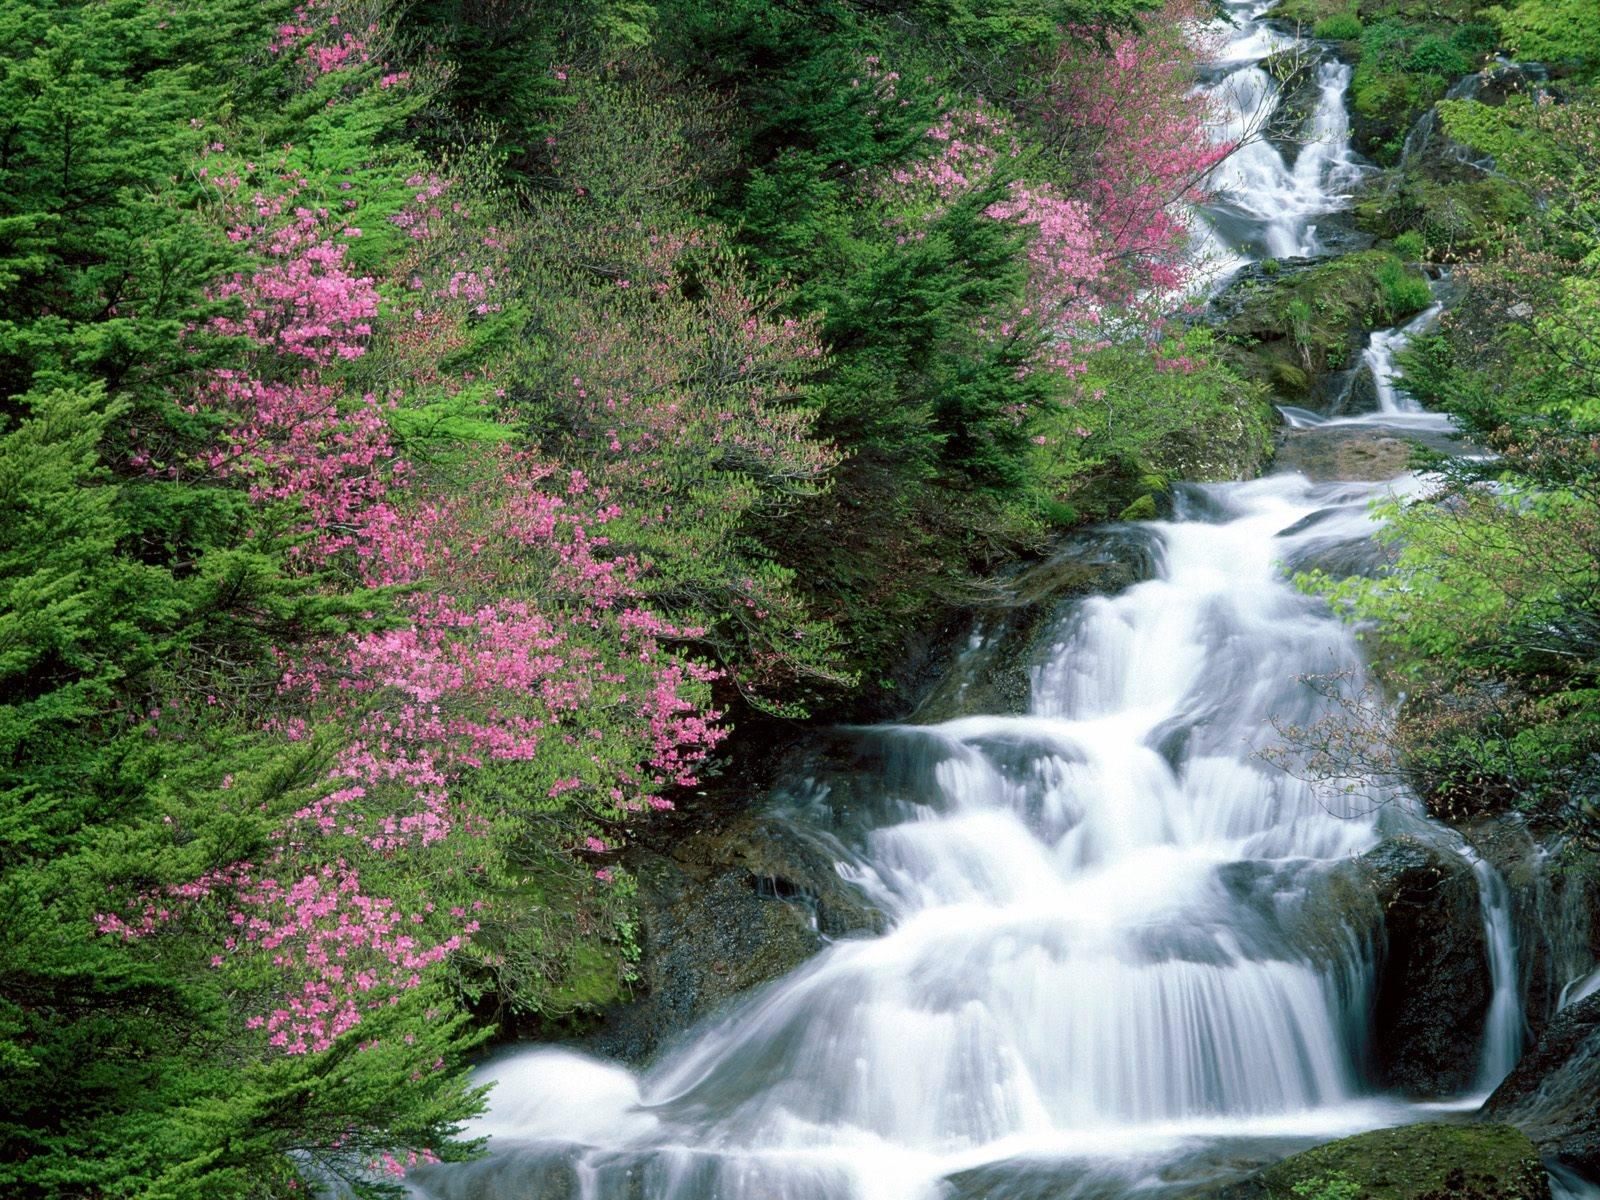 Free Wallpaper Download: Waterfalls Wallpaper And Desktop